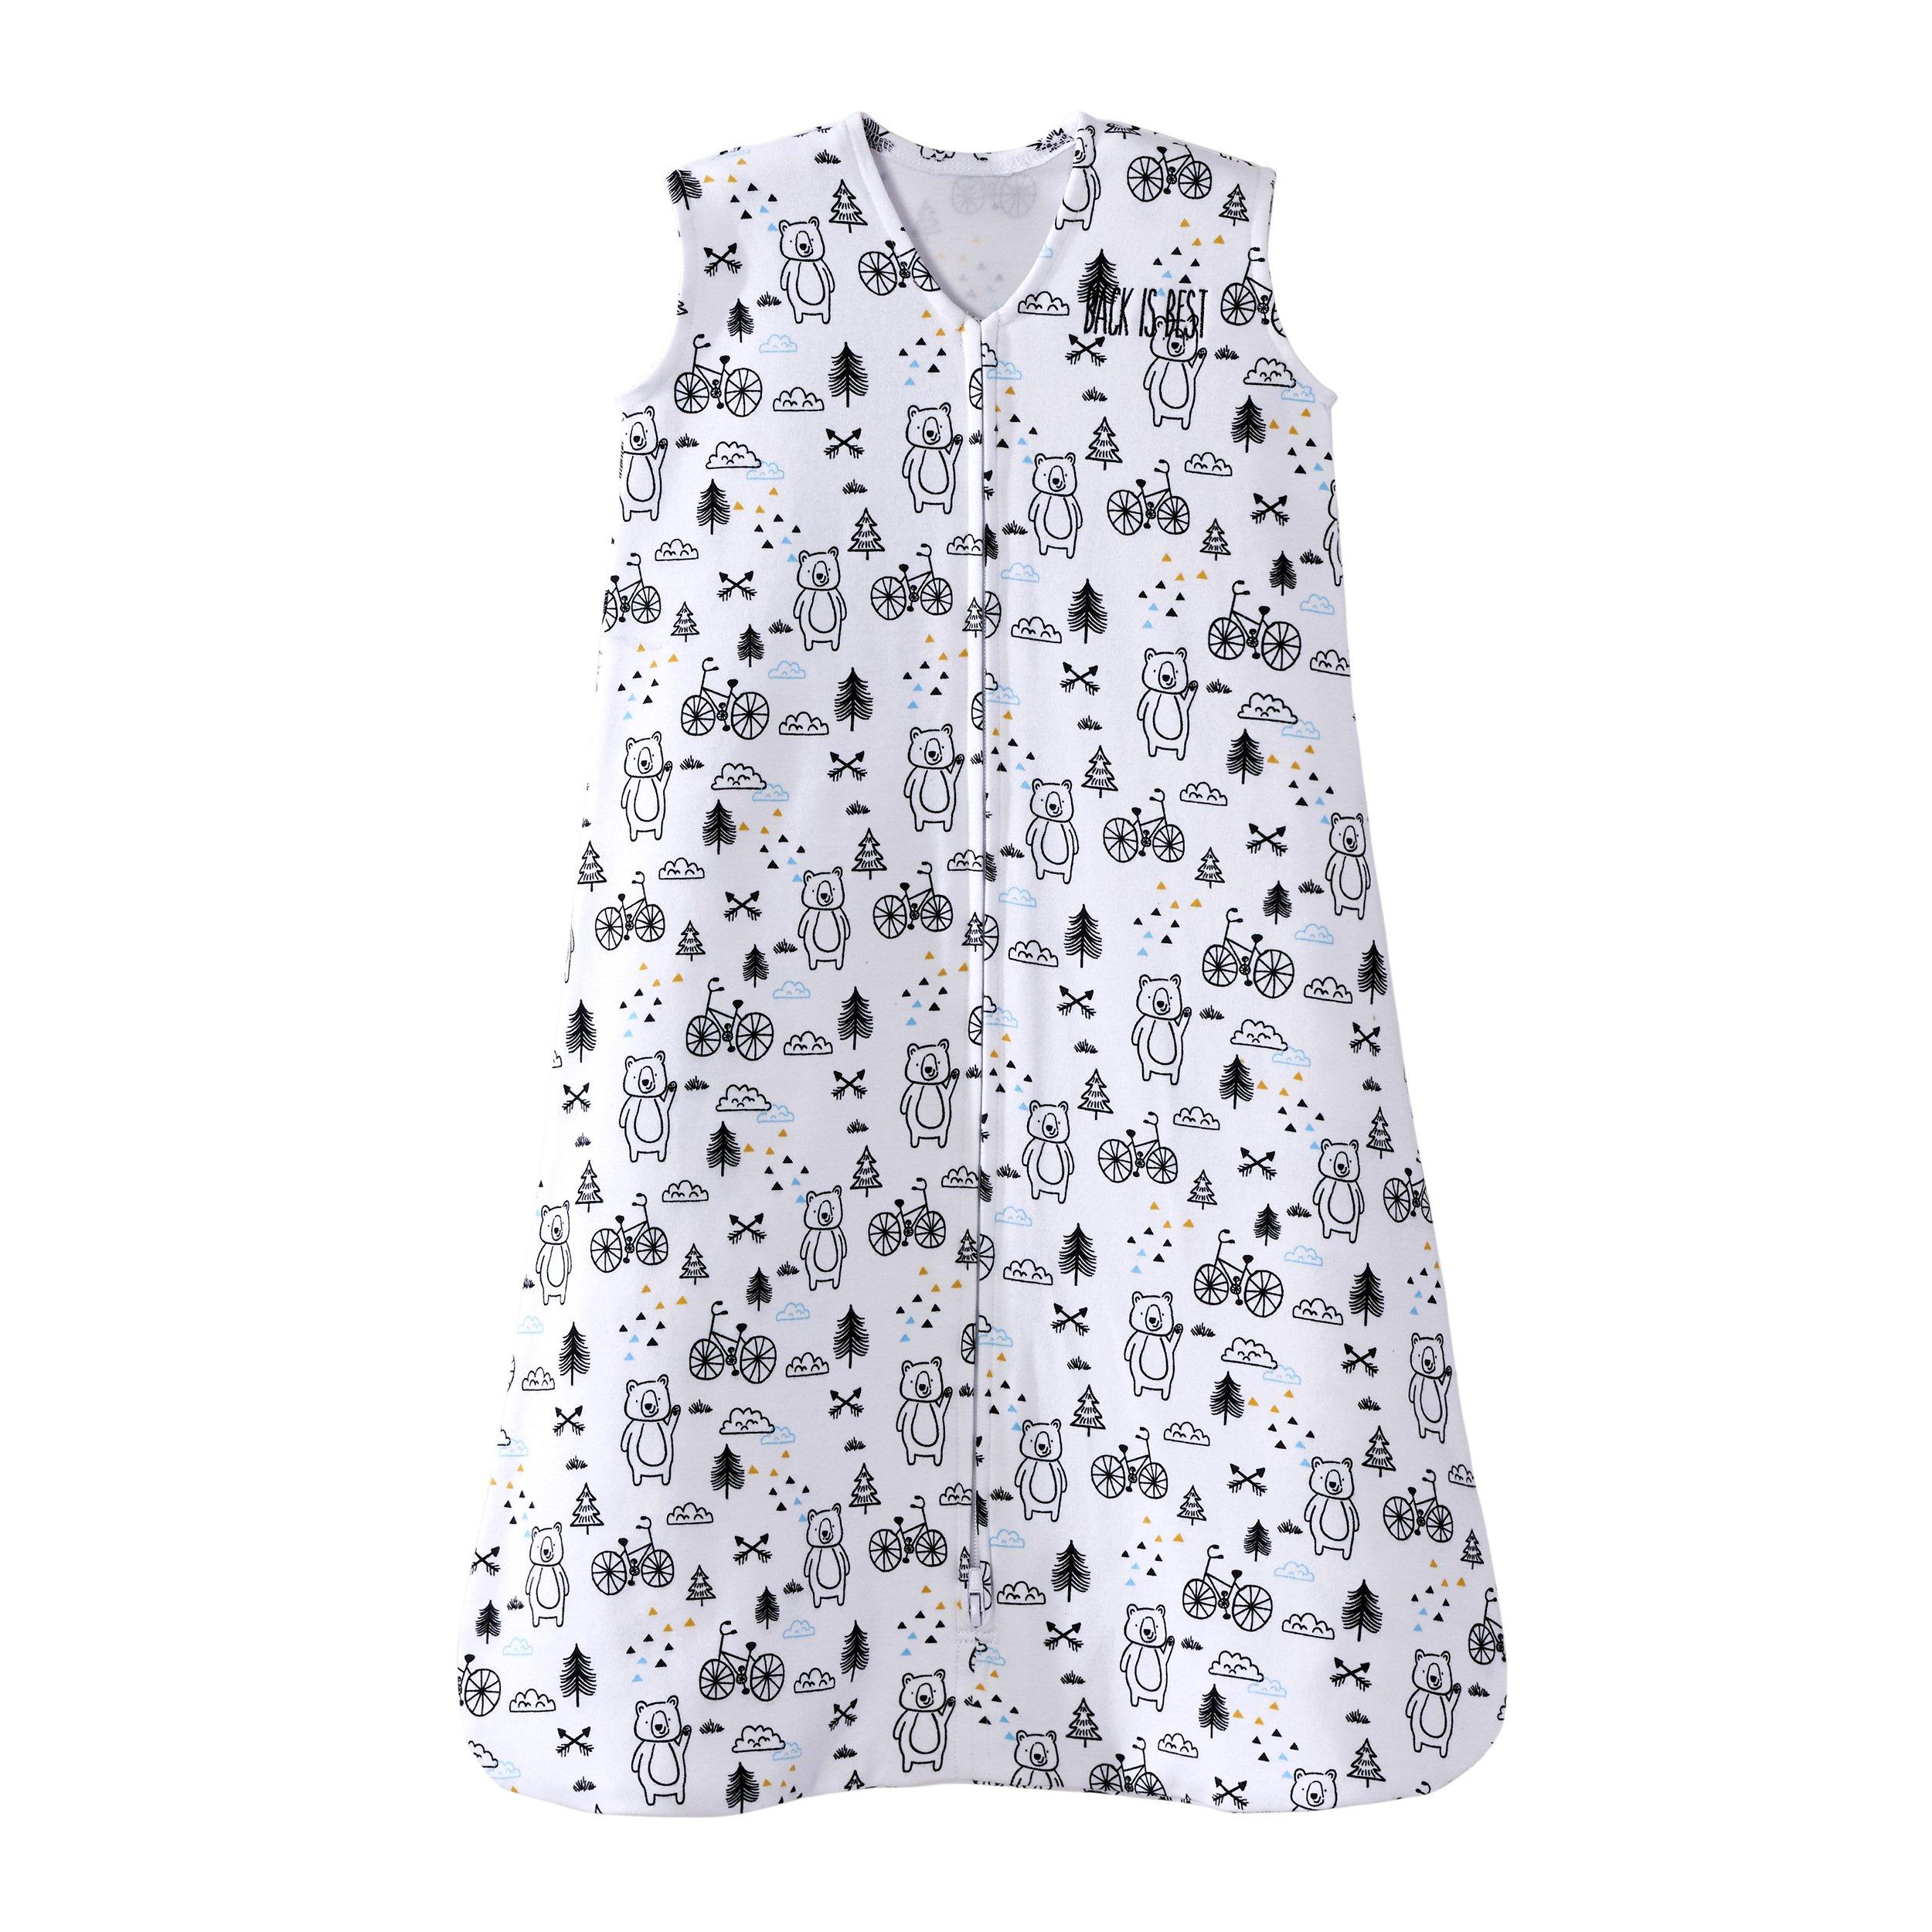 Halo SleepSack 100% Cotton Wearable Blanket, Huggy Bears, Medium